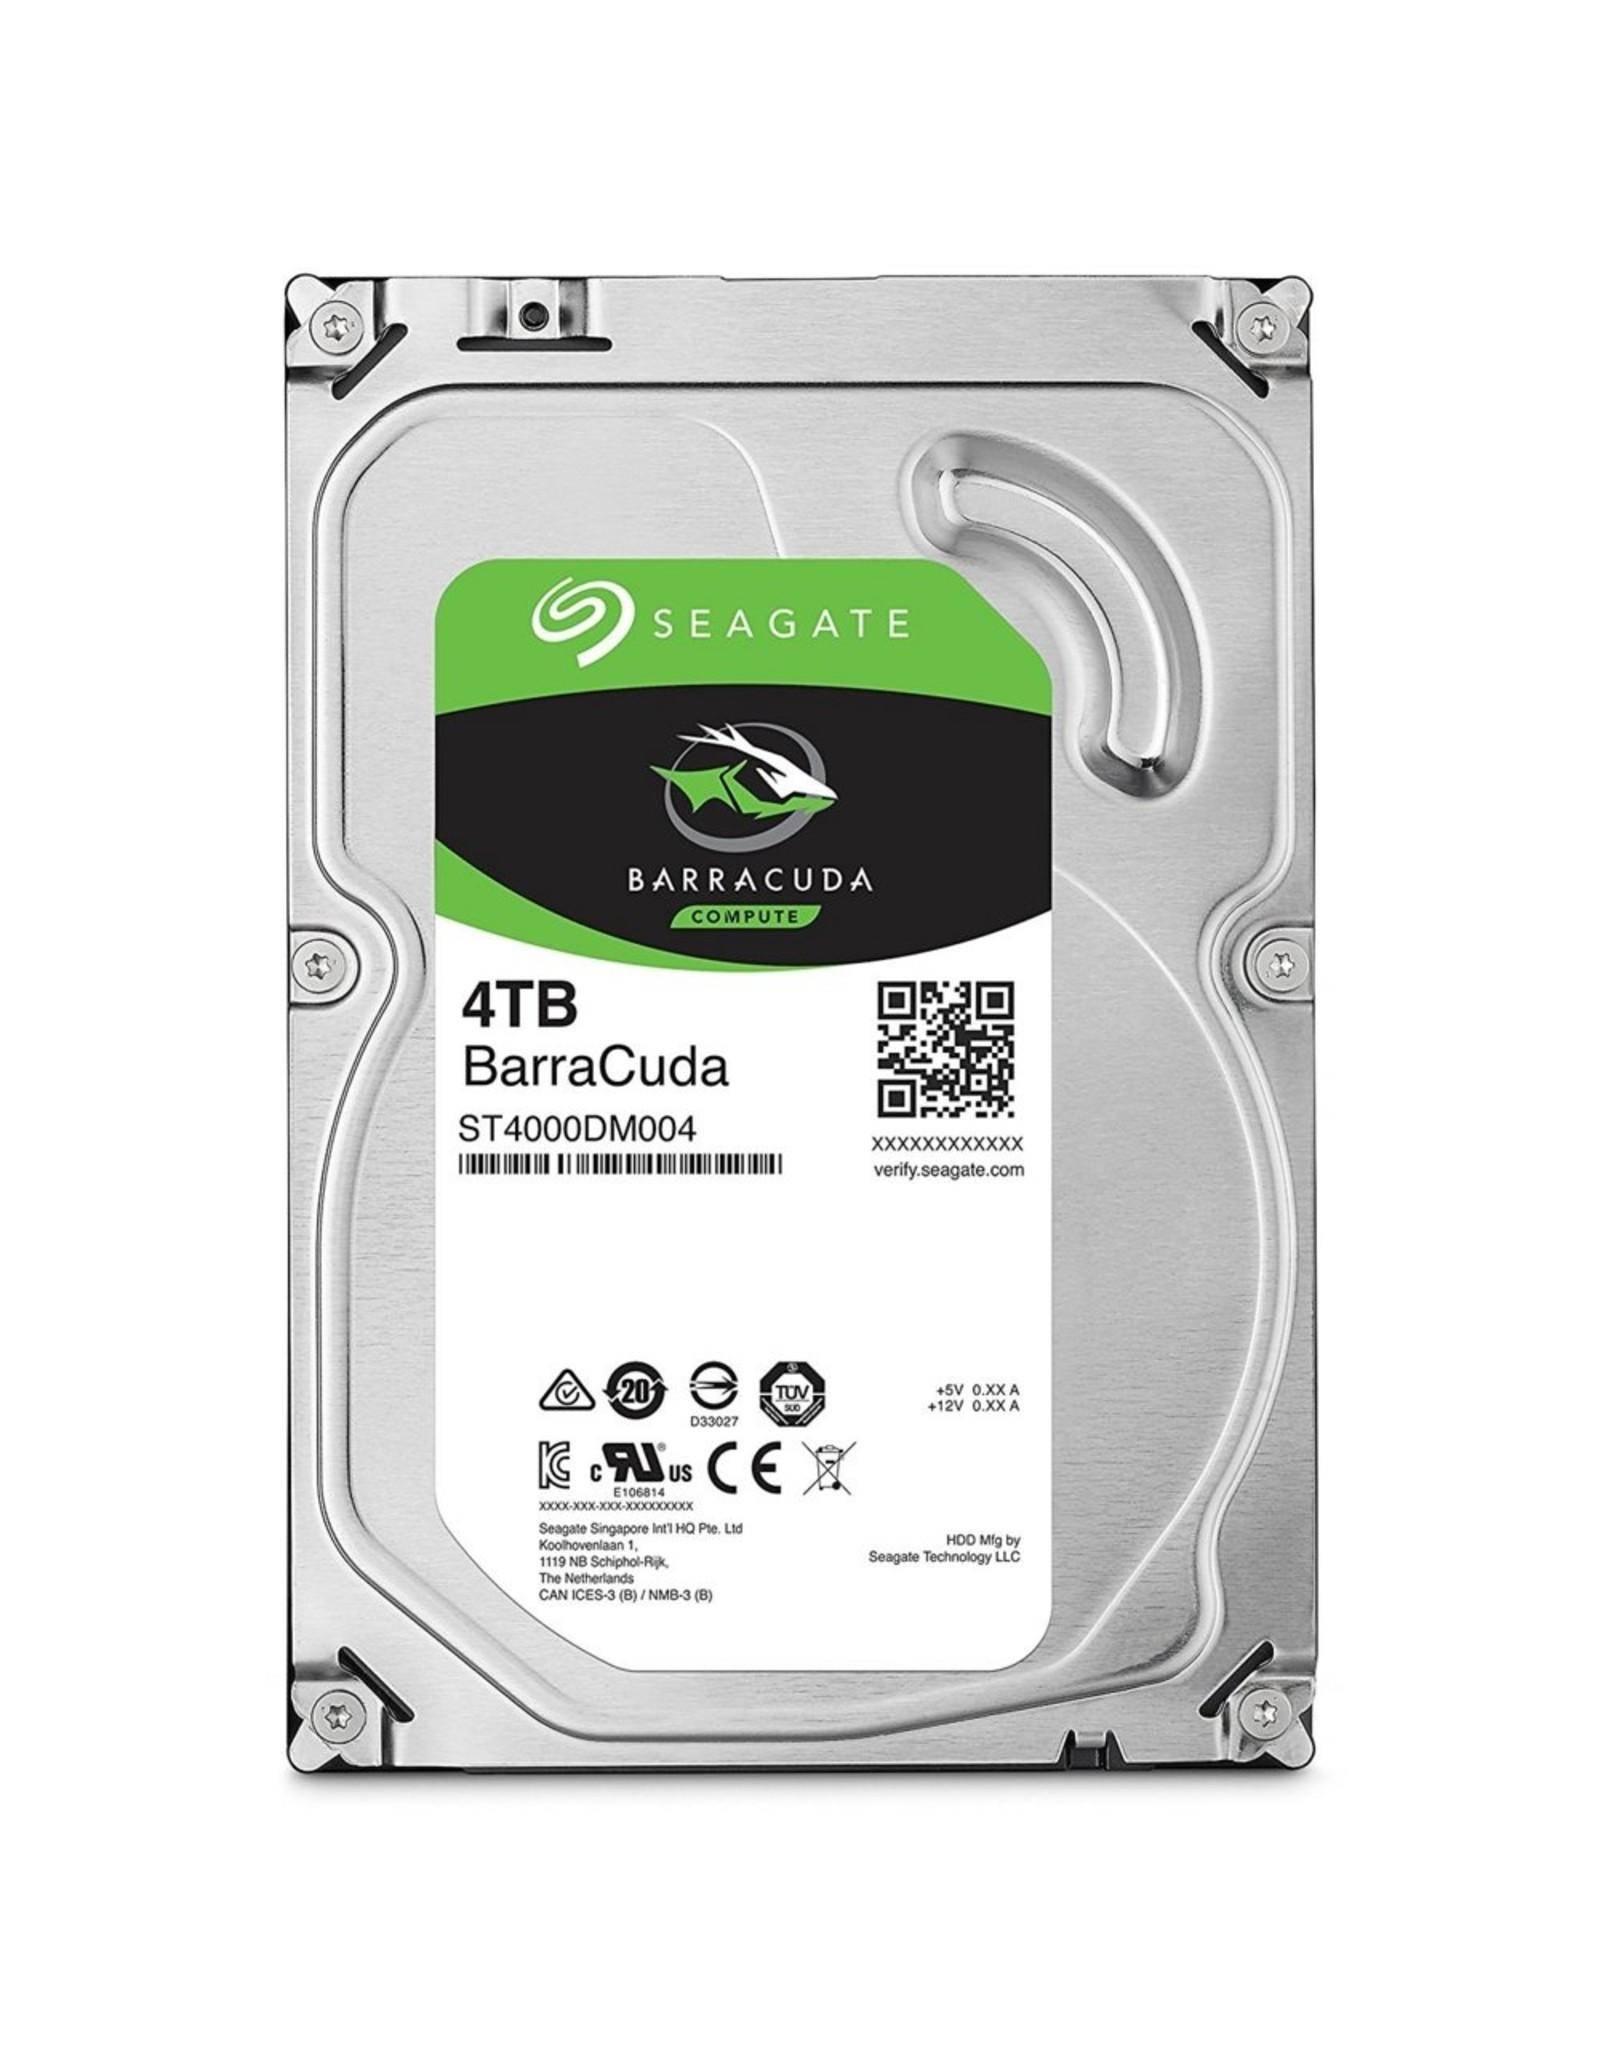 Seagate HDD  4TB - 3.5inch - 5400RPM - 256MB - SATA600